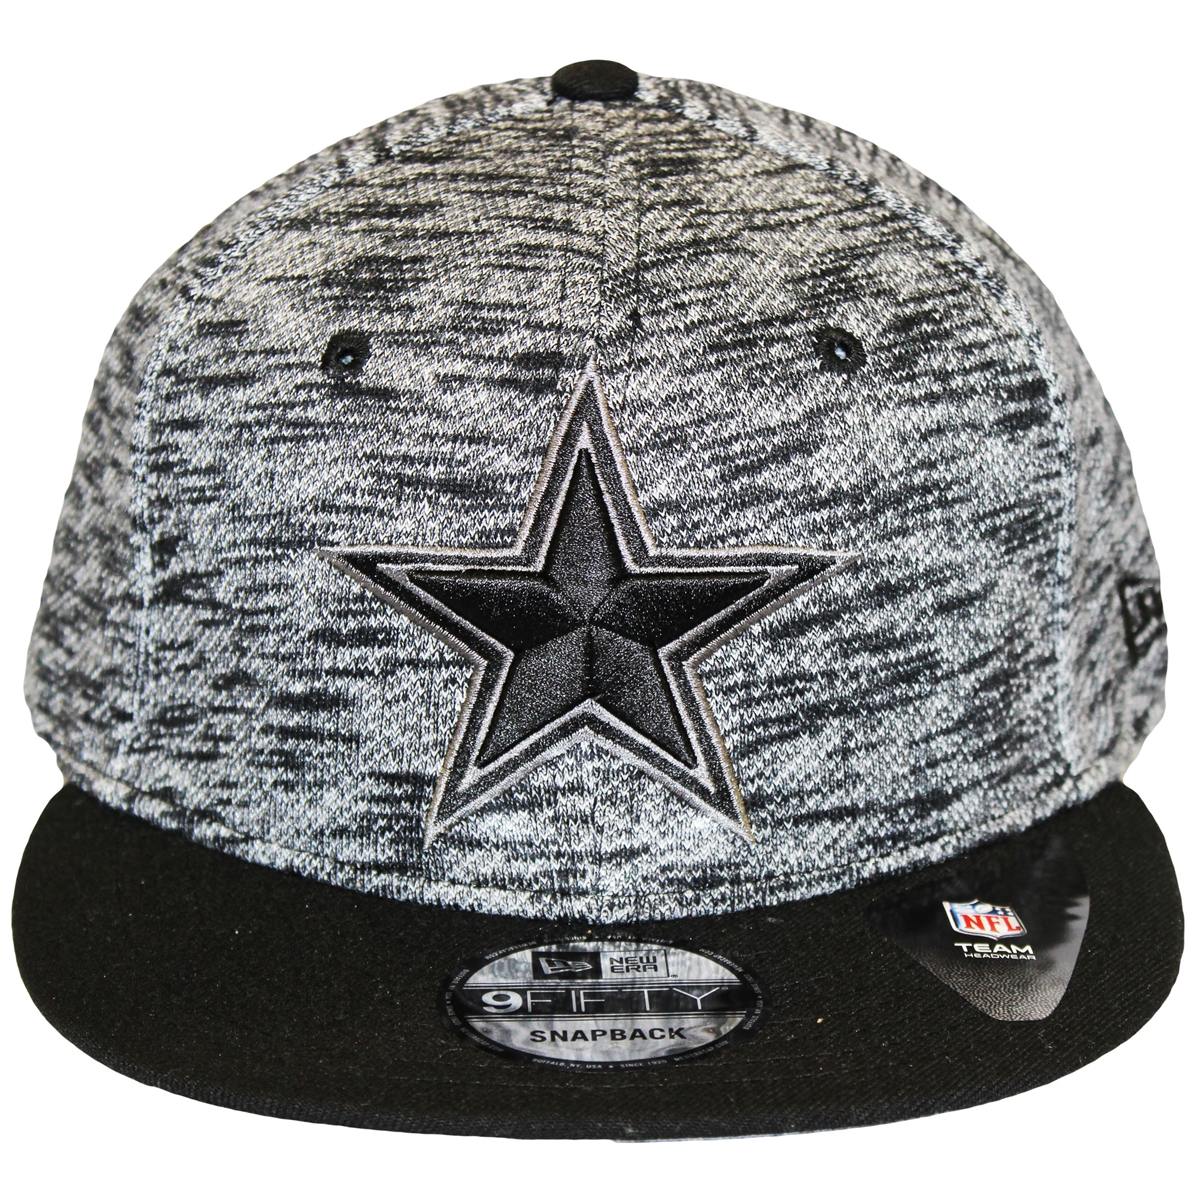 0f737d5105d ... ireland ne 9fifty terry fresh dallas cowboys gray black snapback hat  nfl 3 d raised star